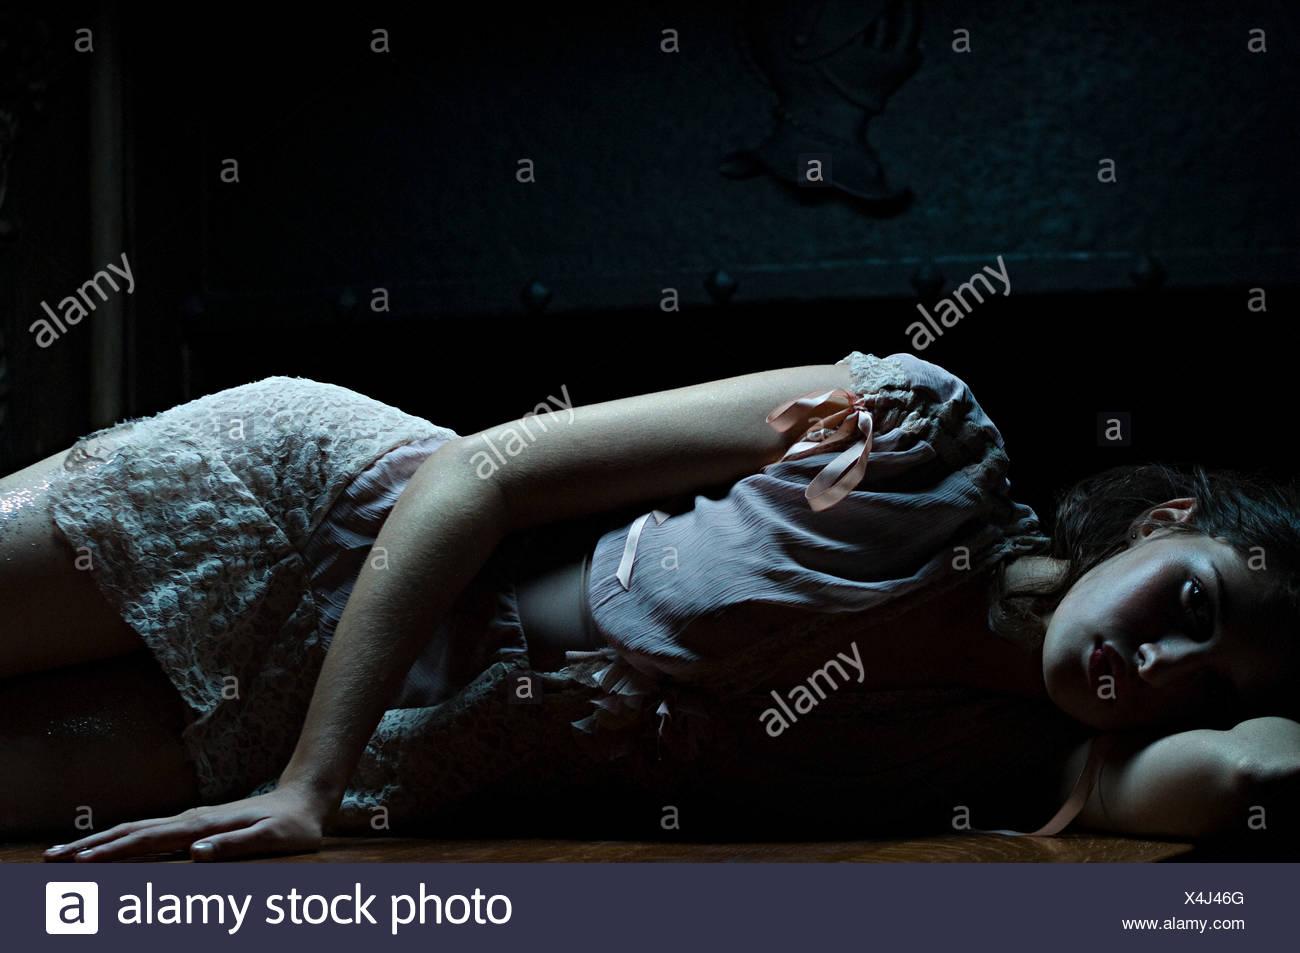 Woman lying is shadows - Stock Image